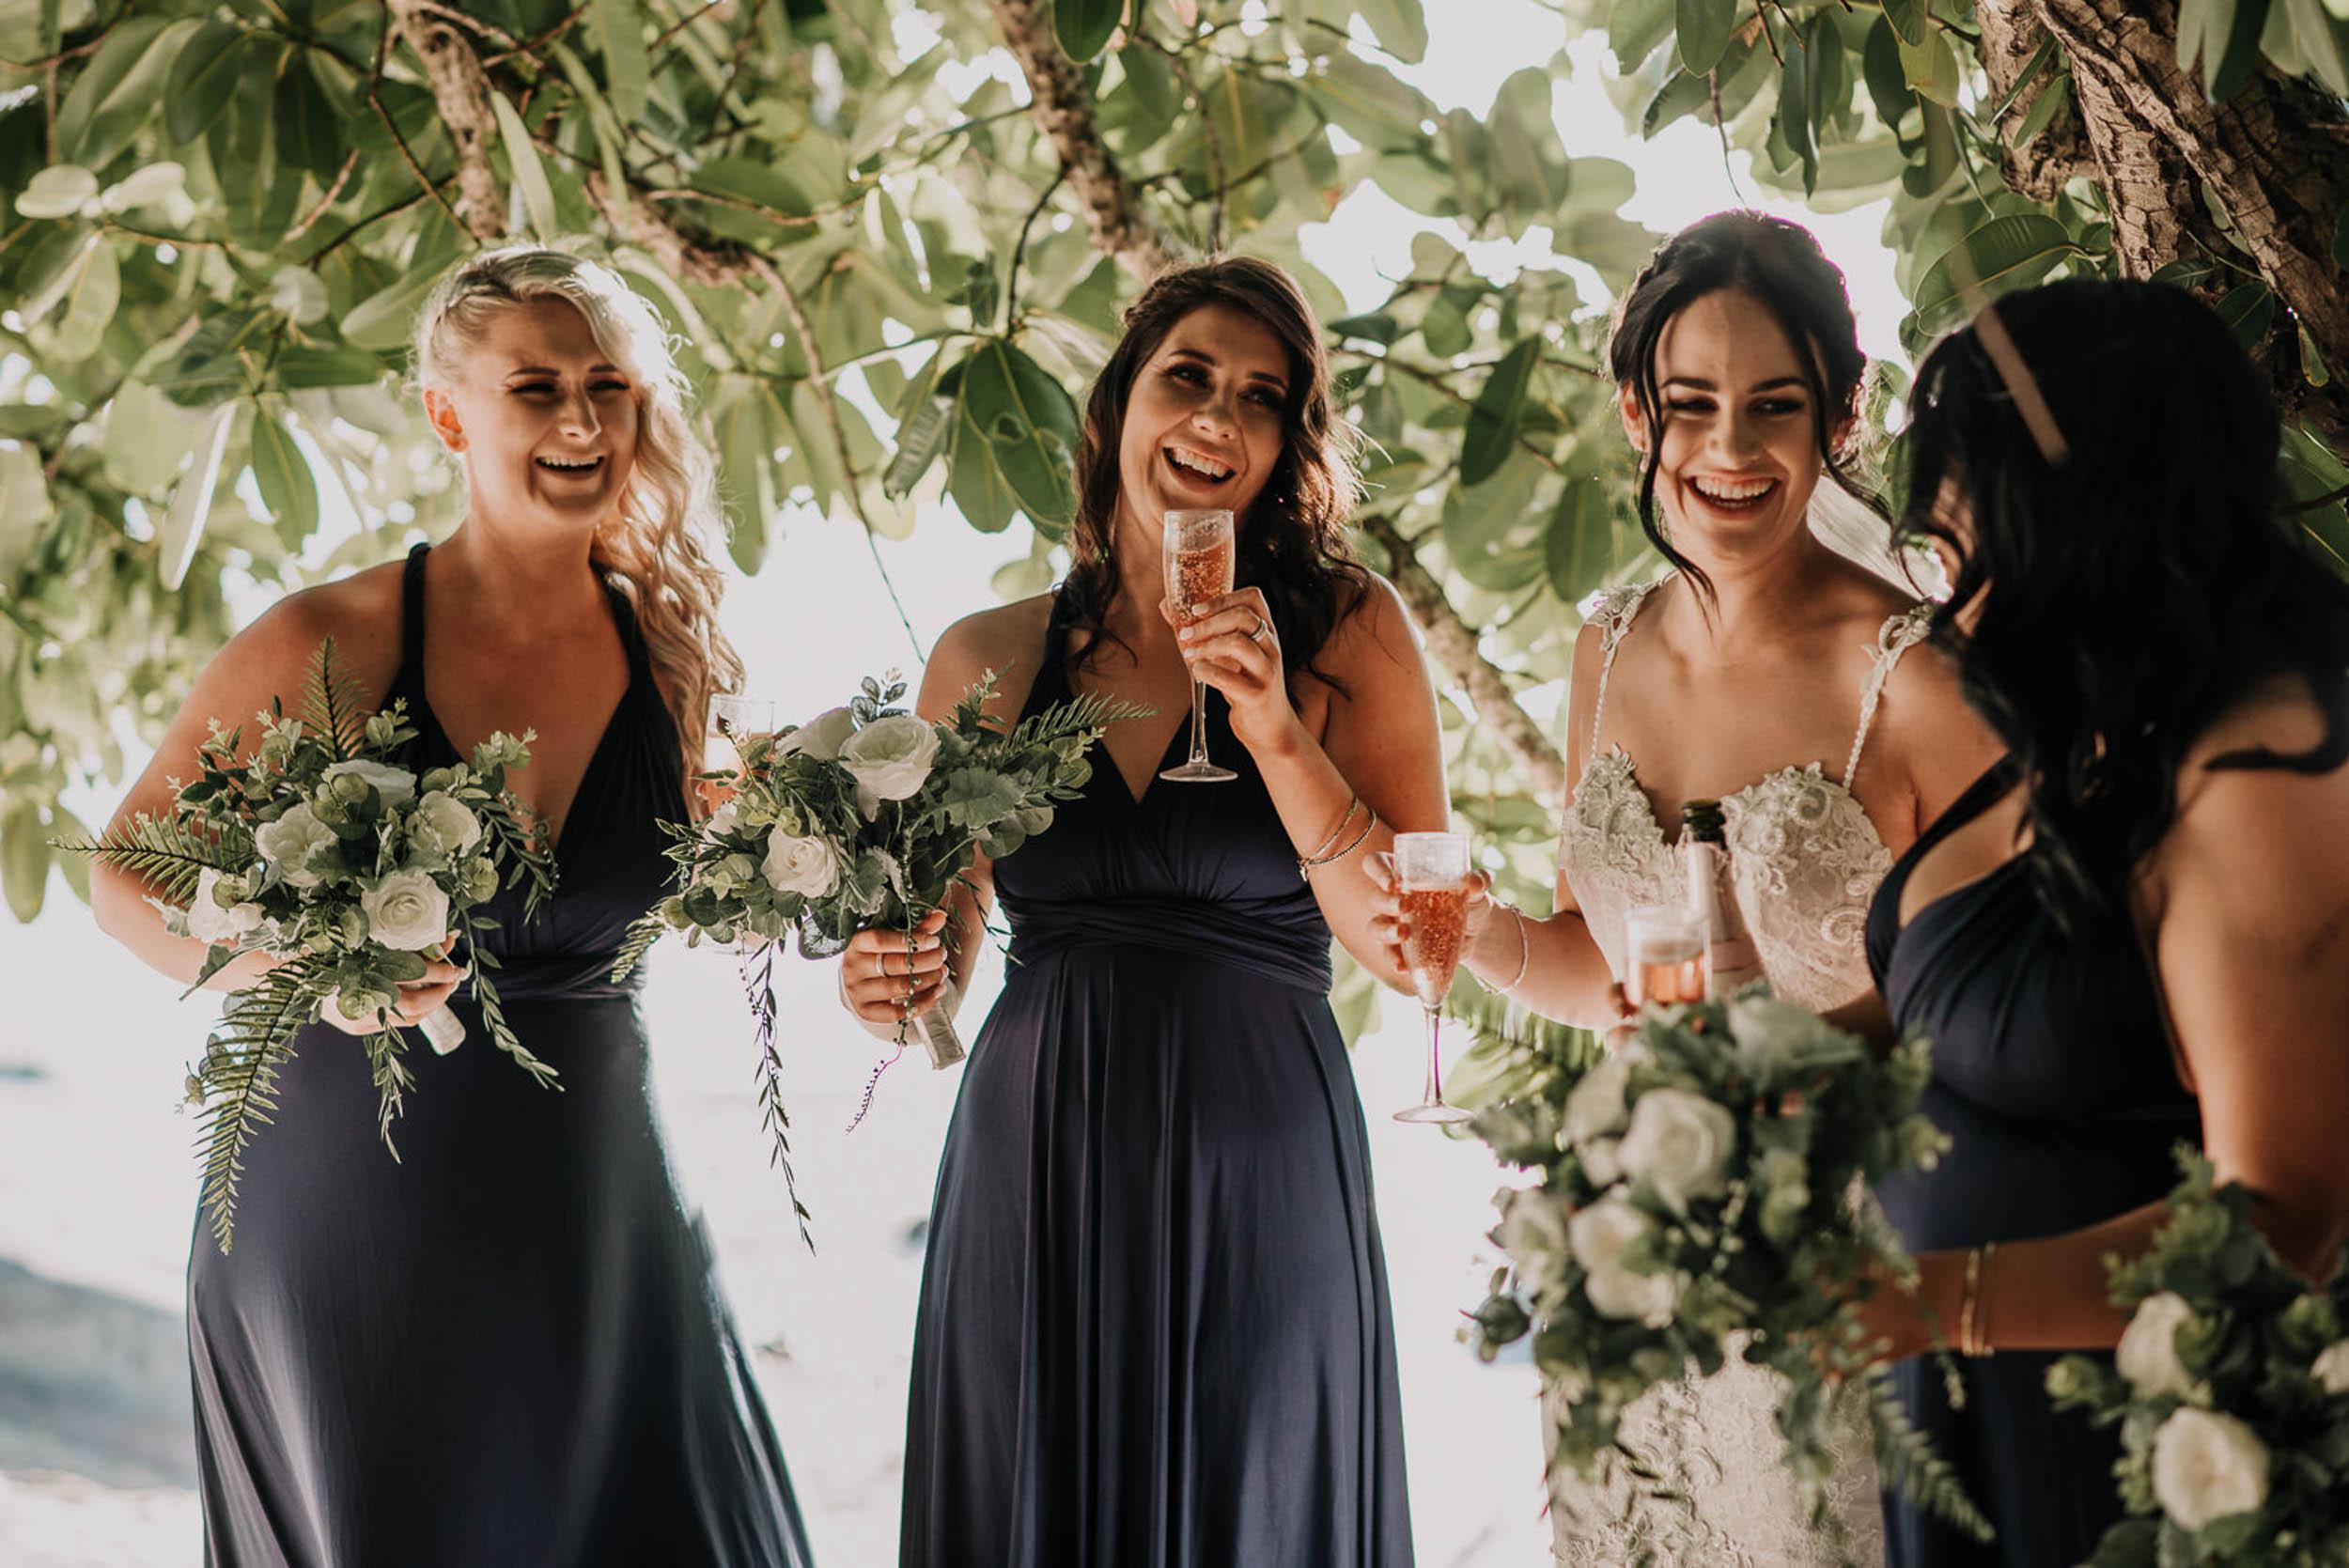 The Raw Photographer - Cairns Wedding Photographer - Fitzroy Island - Destination Wedding - Bride Dress - Groom Portrait - Queensland-28.jpg